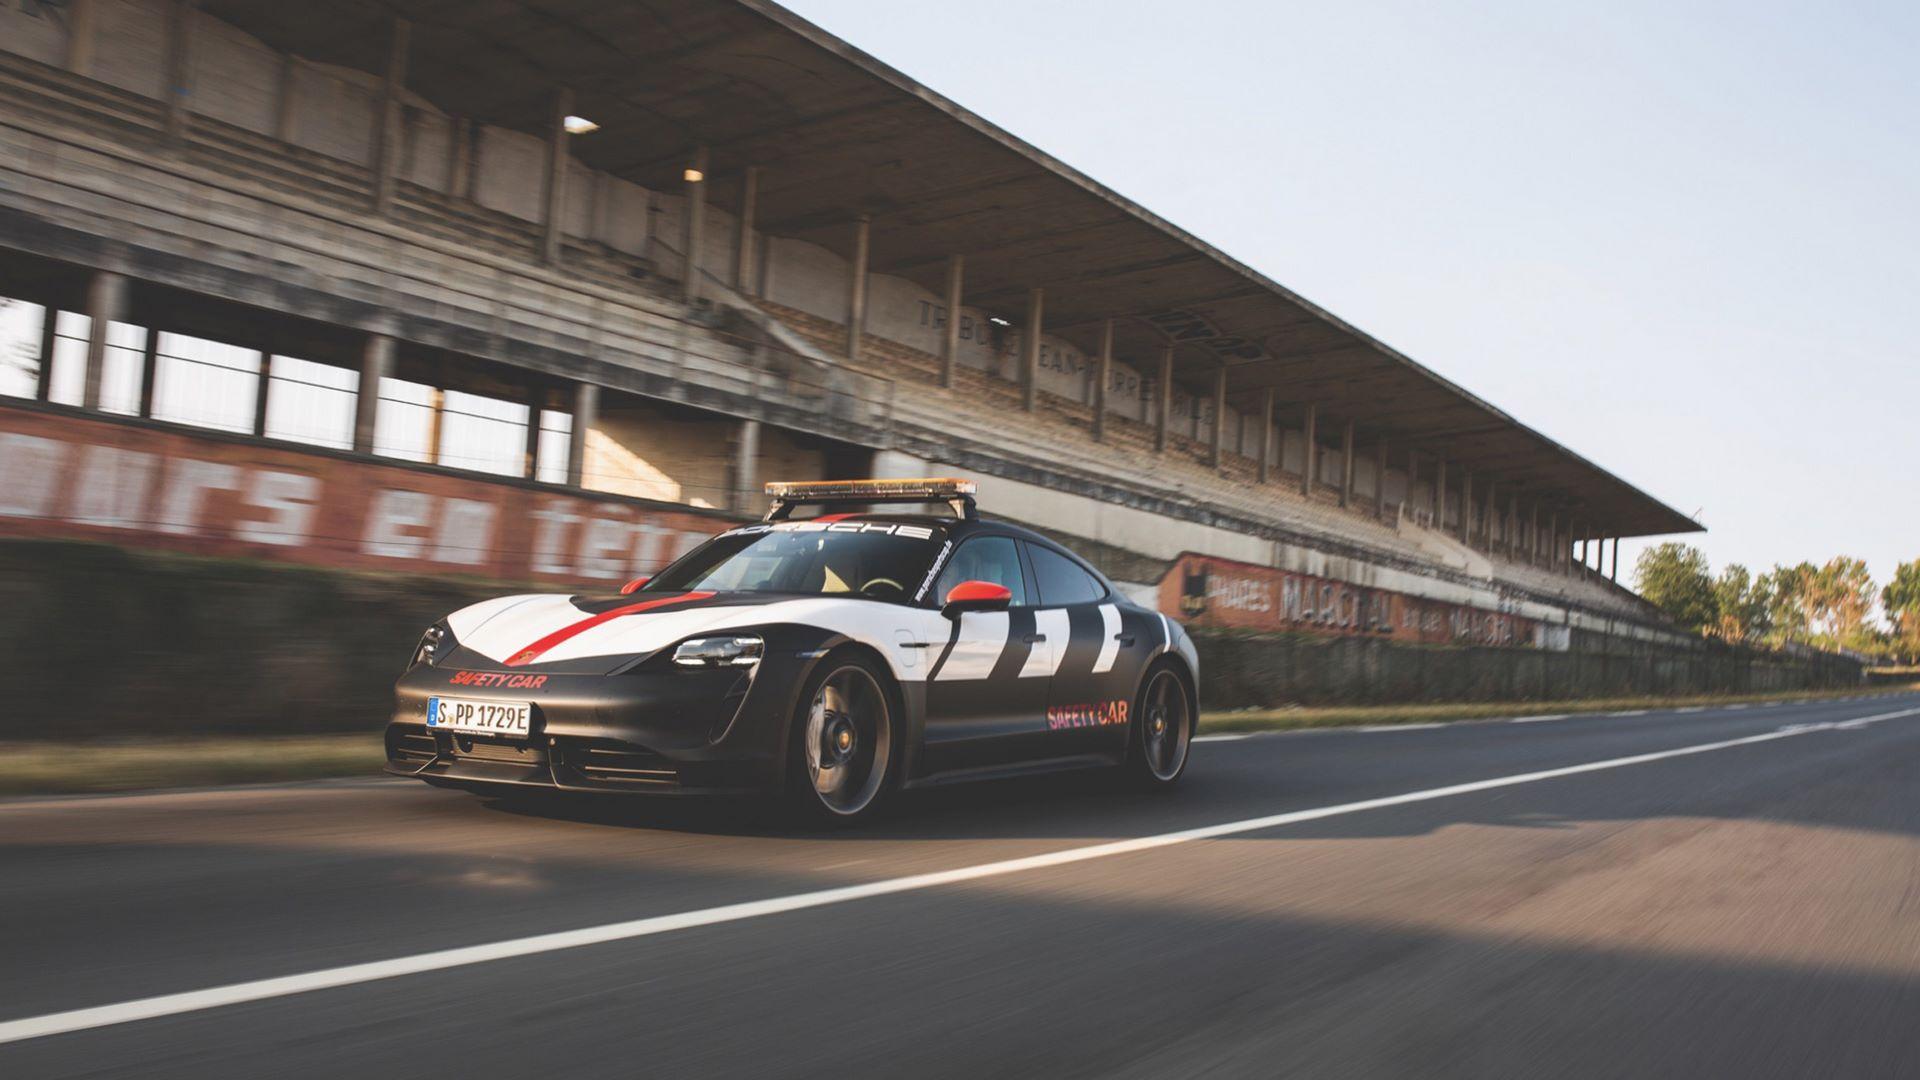 Porsche-Taycan-Turbo-safety-car-Le-Mans-2020-3